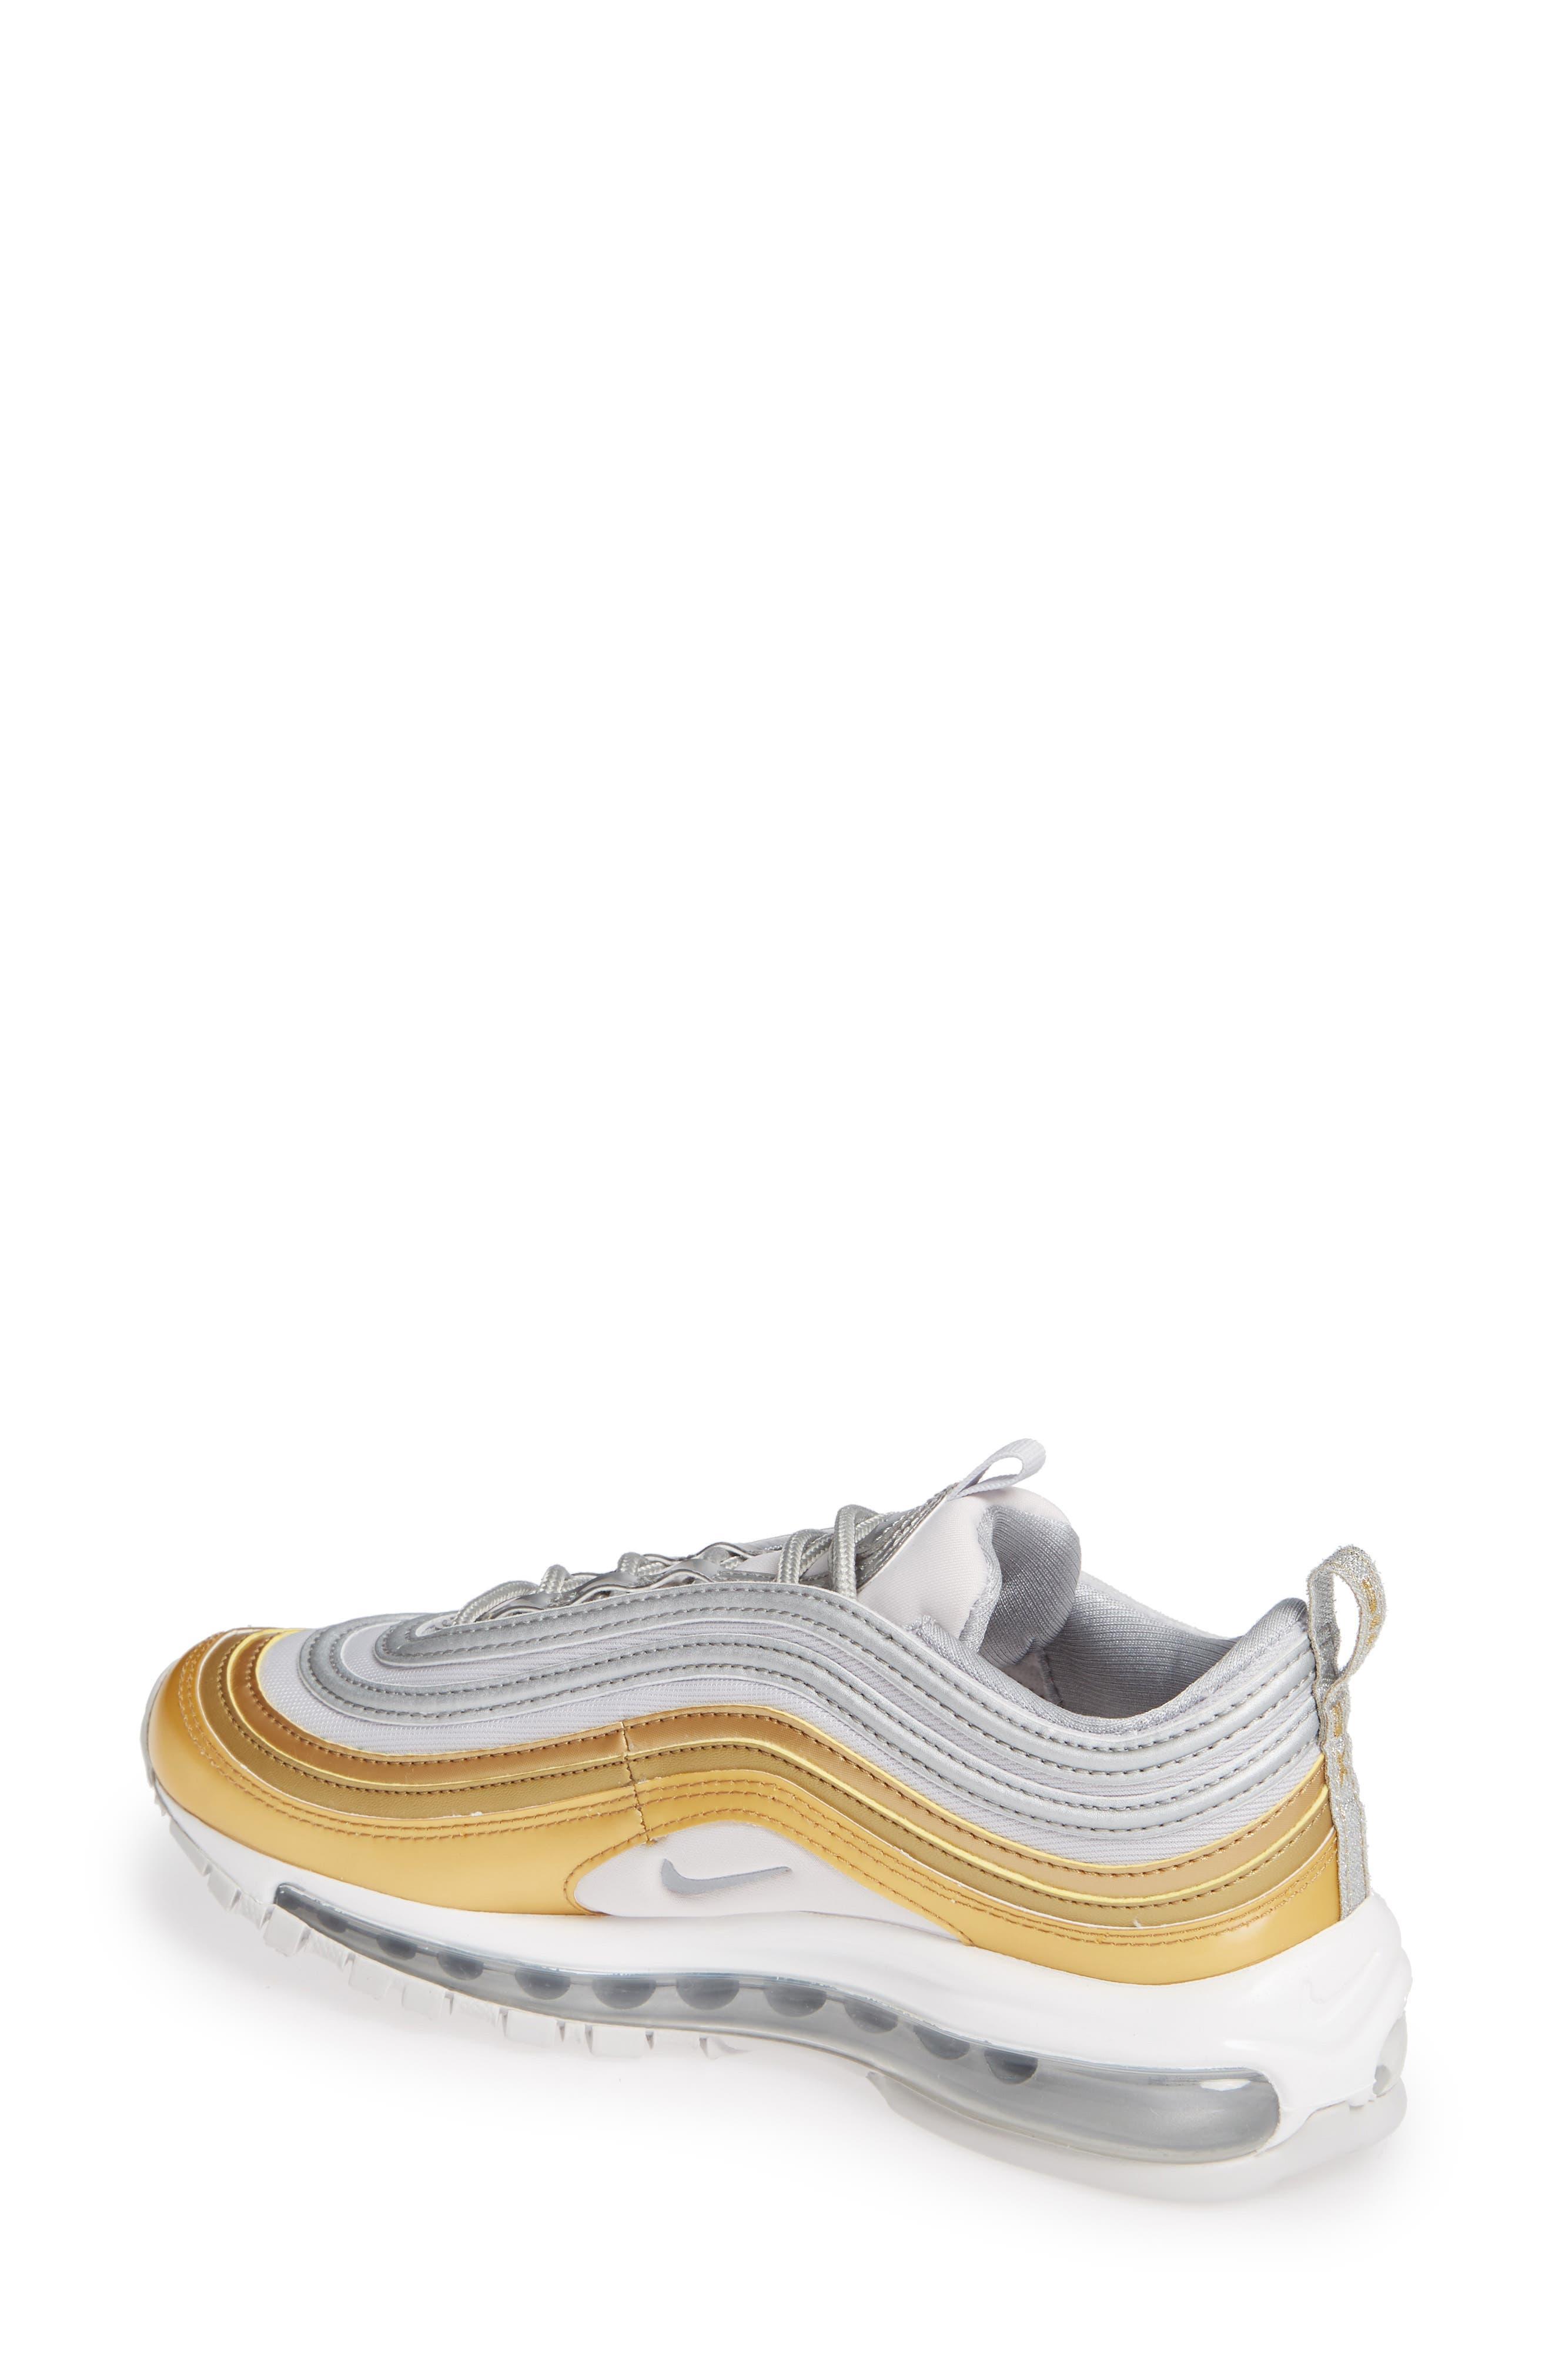 Air Max 97 SE Sneaker,                             Alternate thumbnail 2, color,                             GREY/ METALLIC SILVER- GOLD